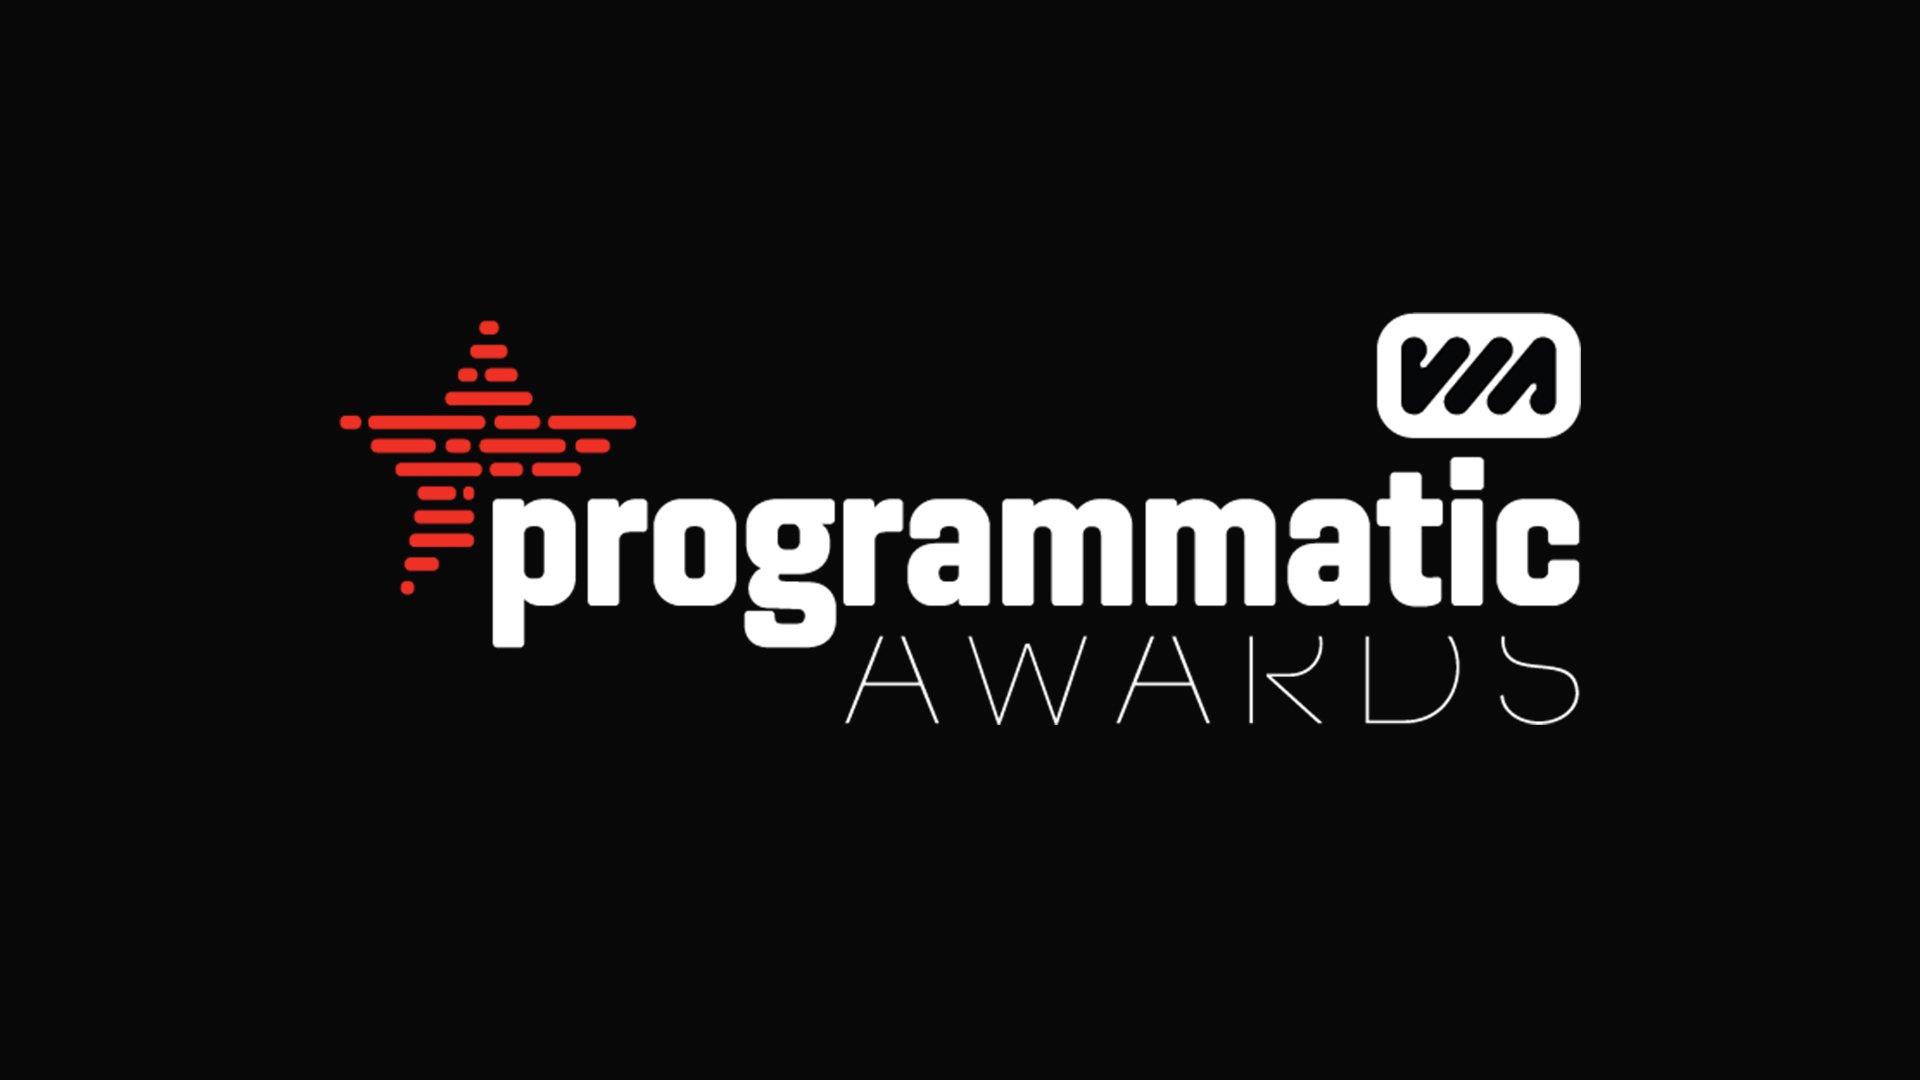 Programmatic Awards 2021